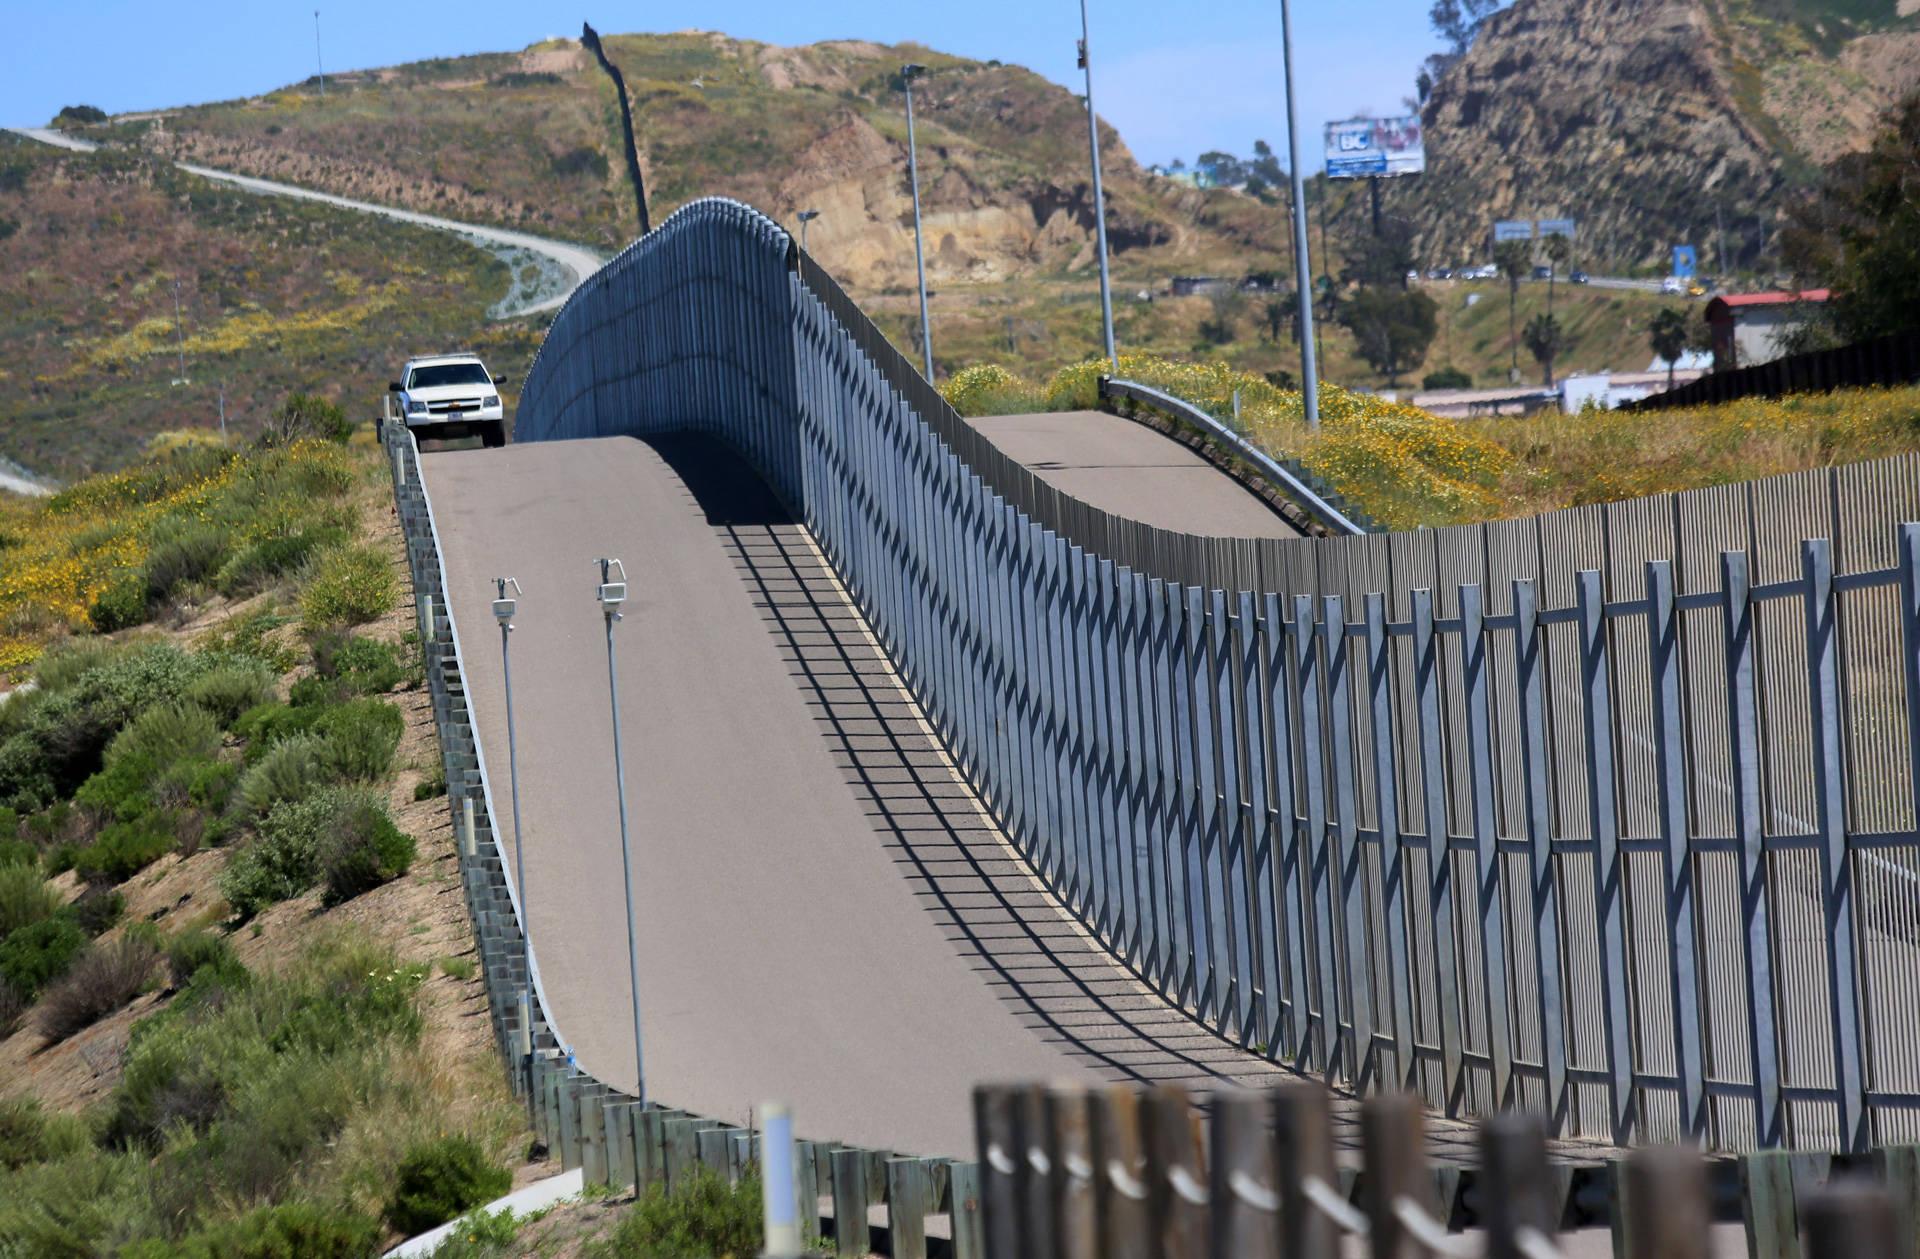 Border Patrol agents patrol the US-Mexico border near San Ysidro on Sunday, April 16, 2017.